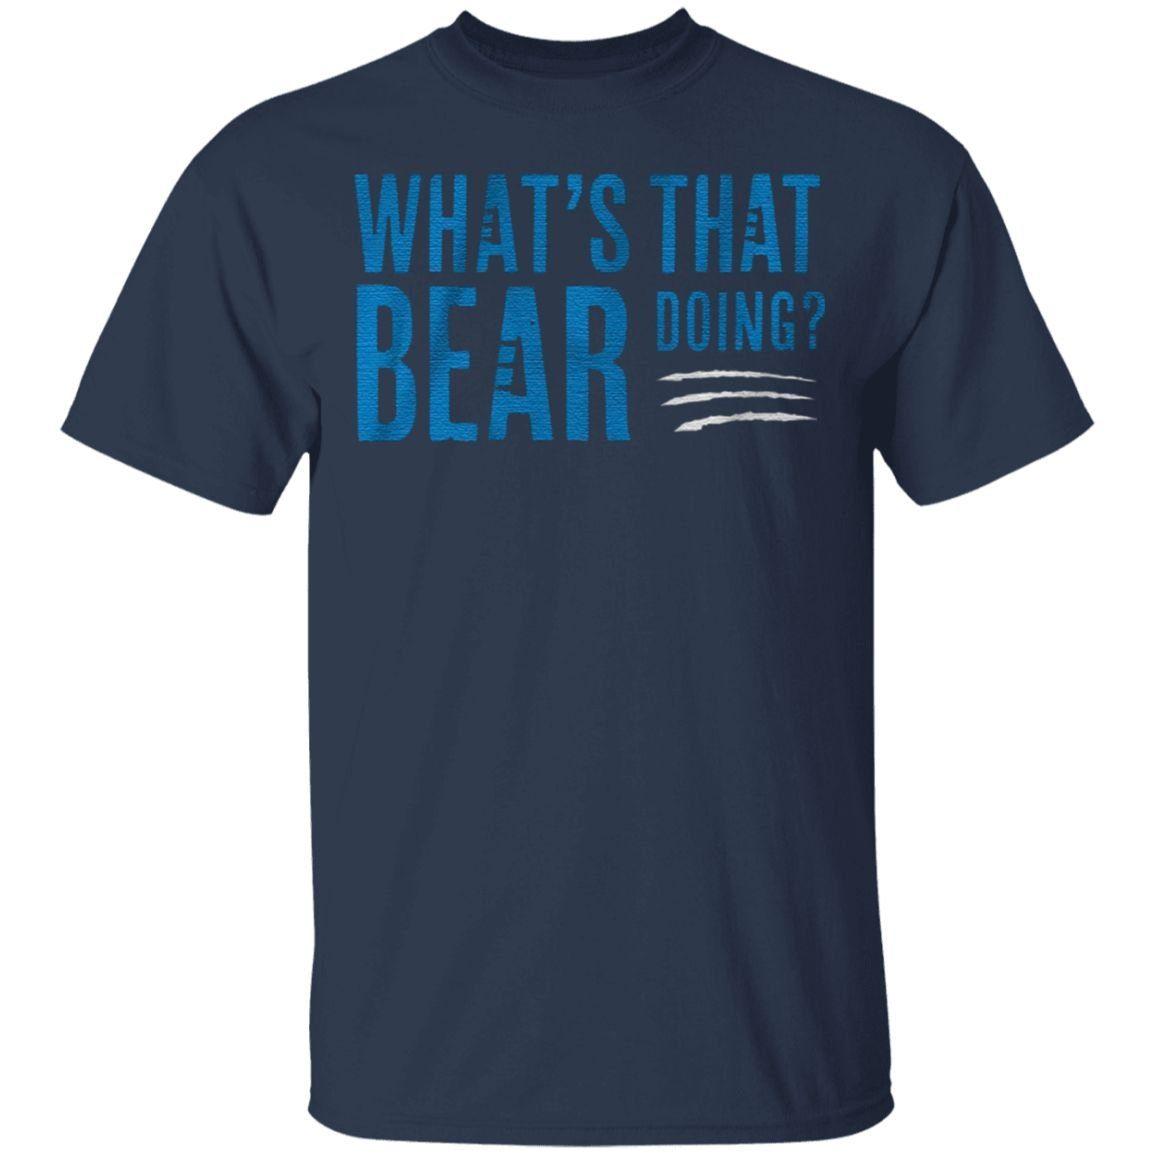 whats that bear doing t shirt